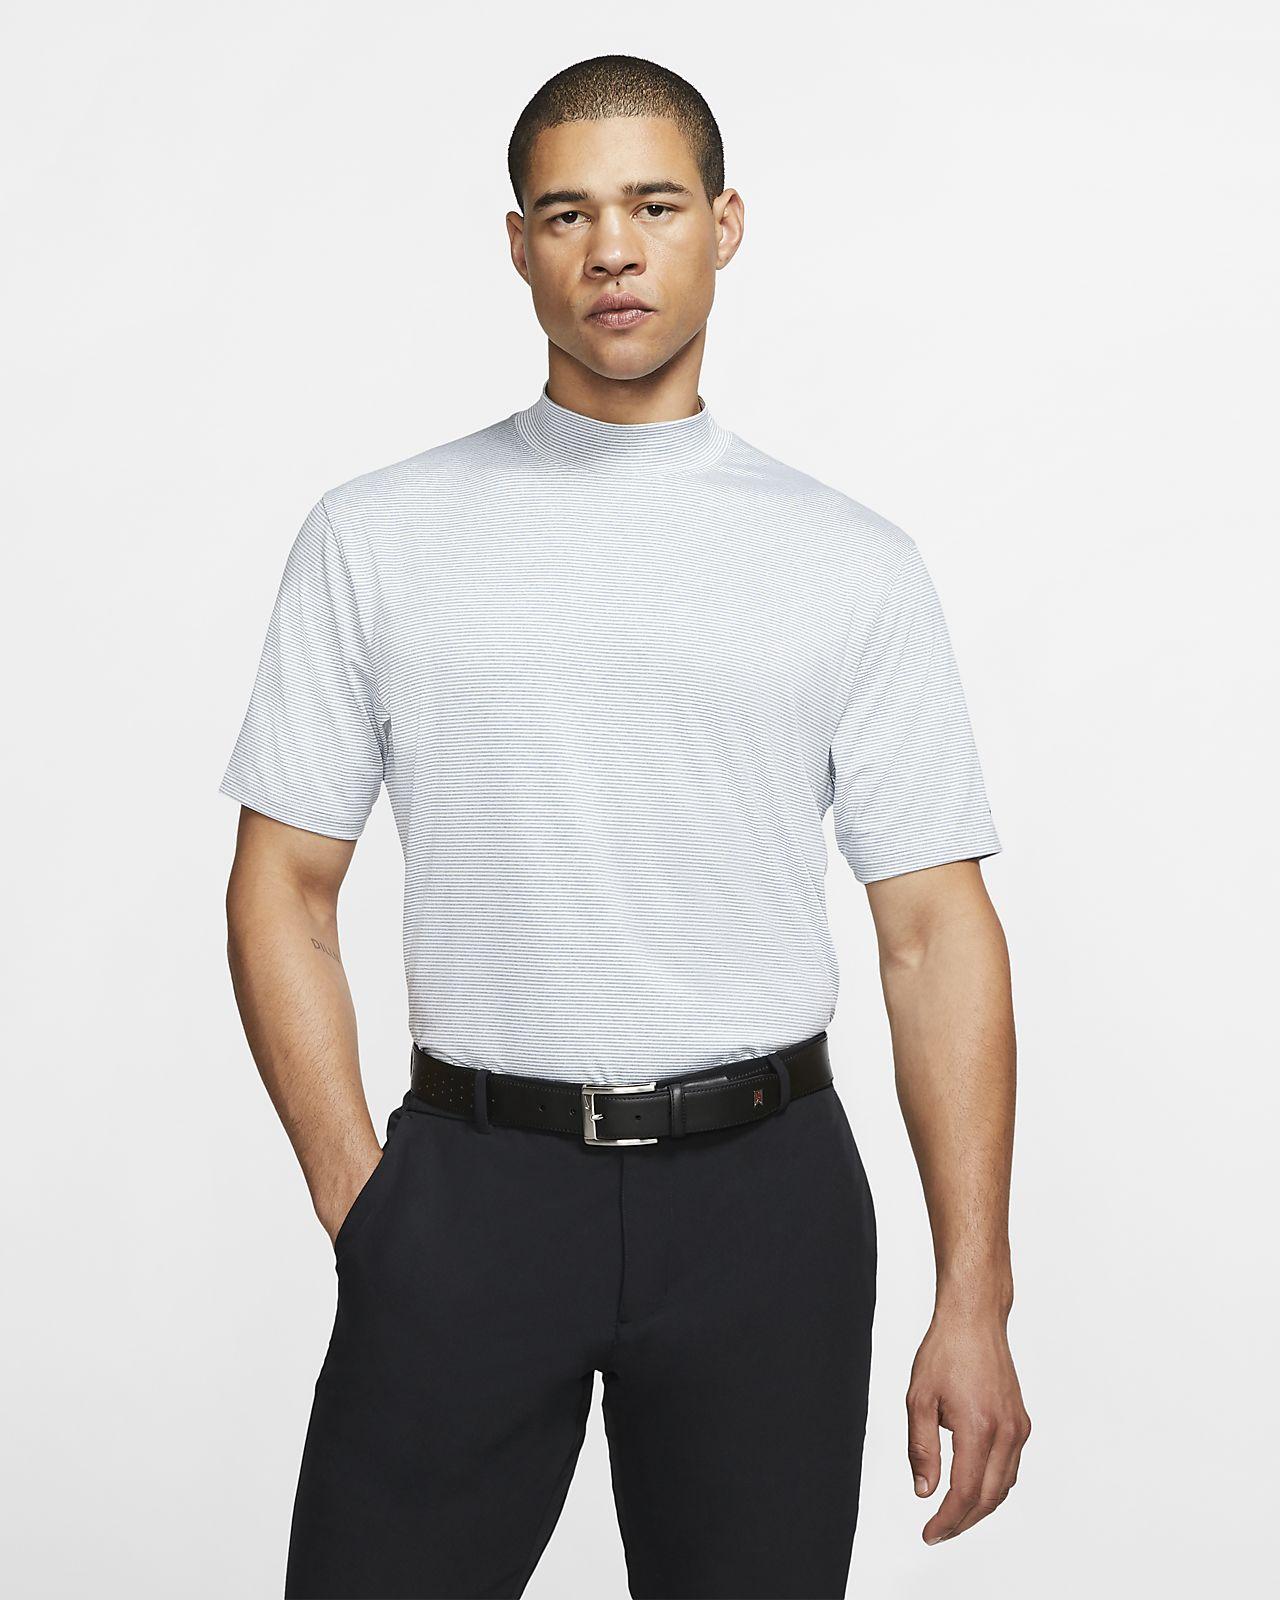 Nike Dri-FIT Tiger Woods Vapor Men's Mock-Neck Golf Top